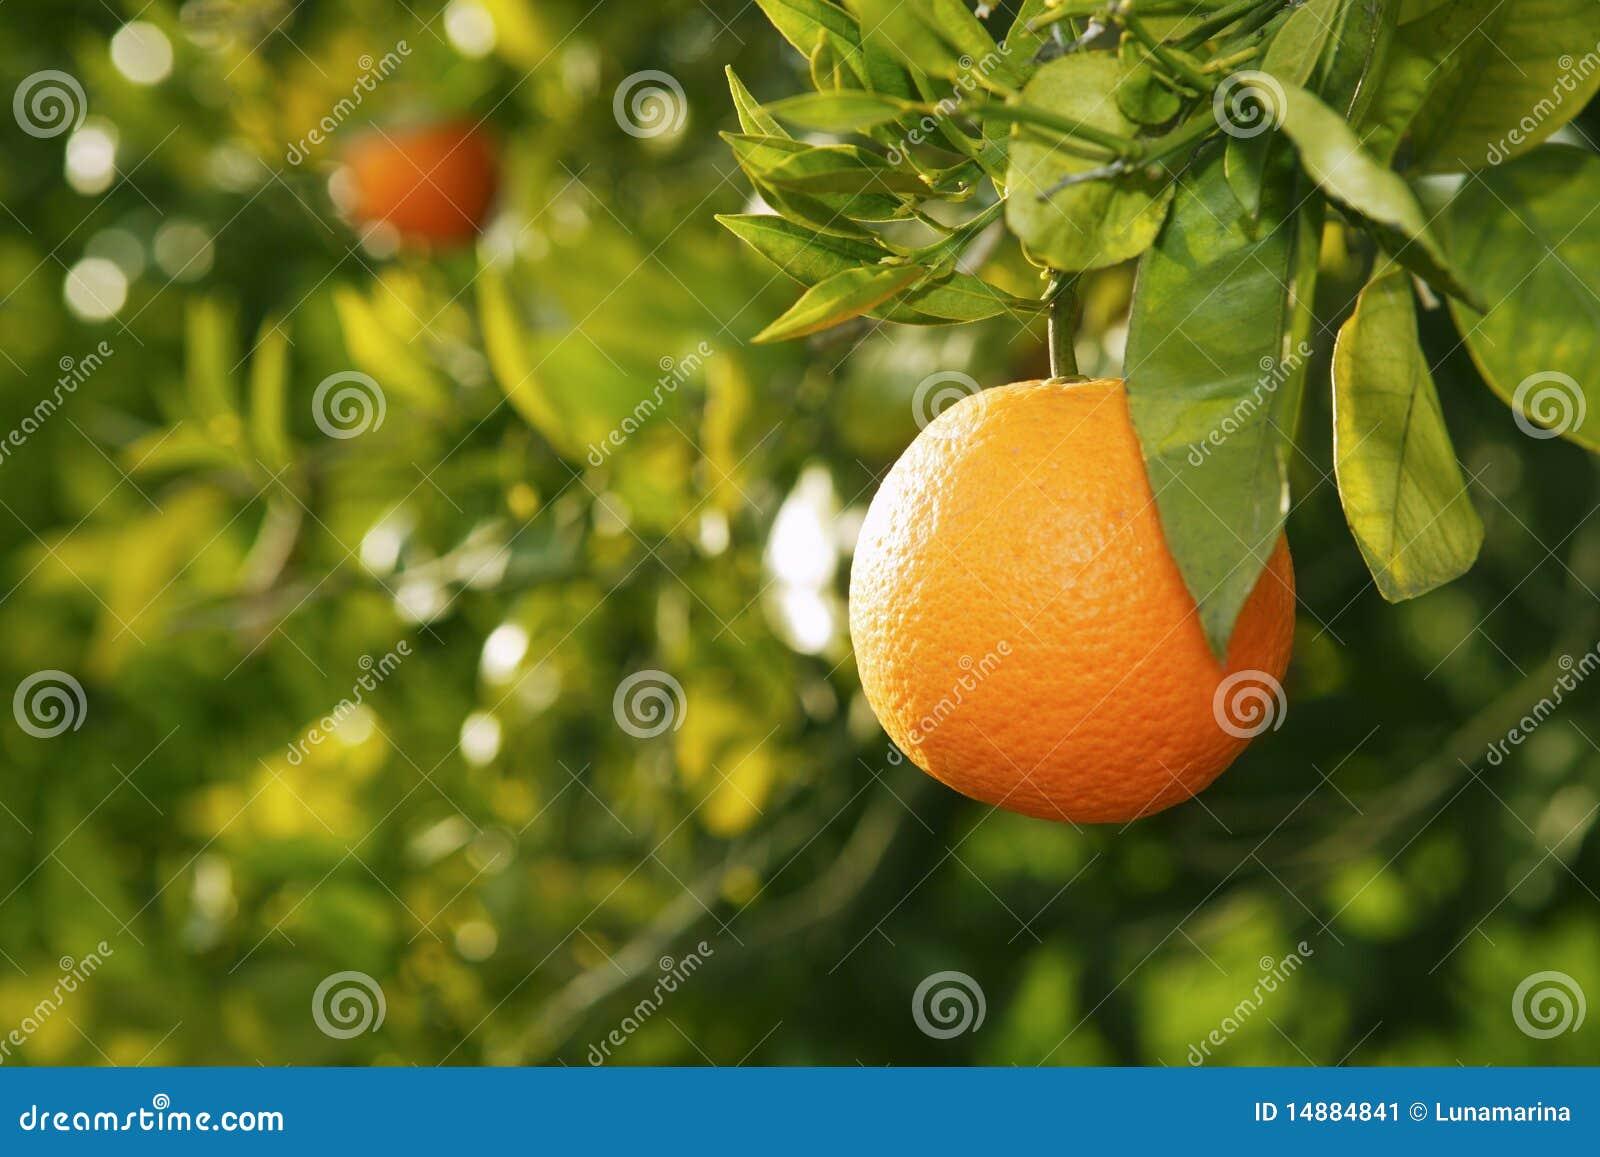 Arbre fruitier orange avant moisson espagne image stock for Arbre fruitier